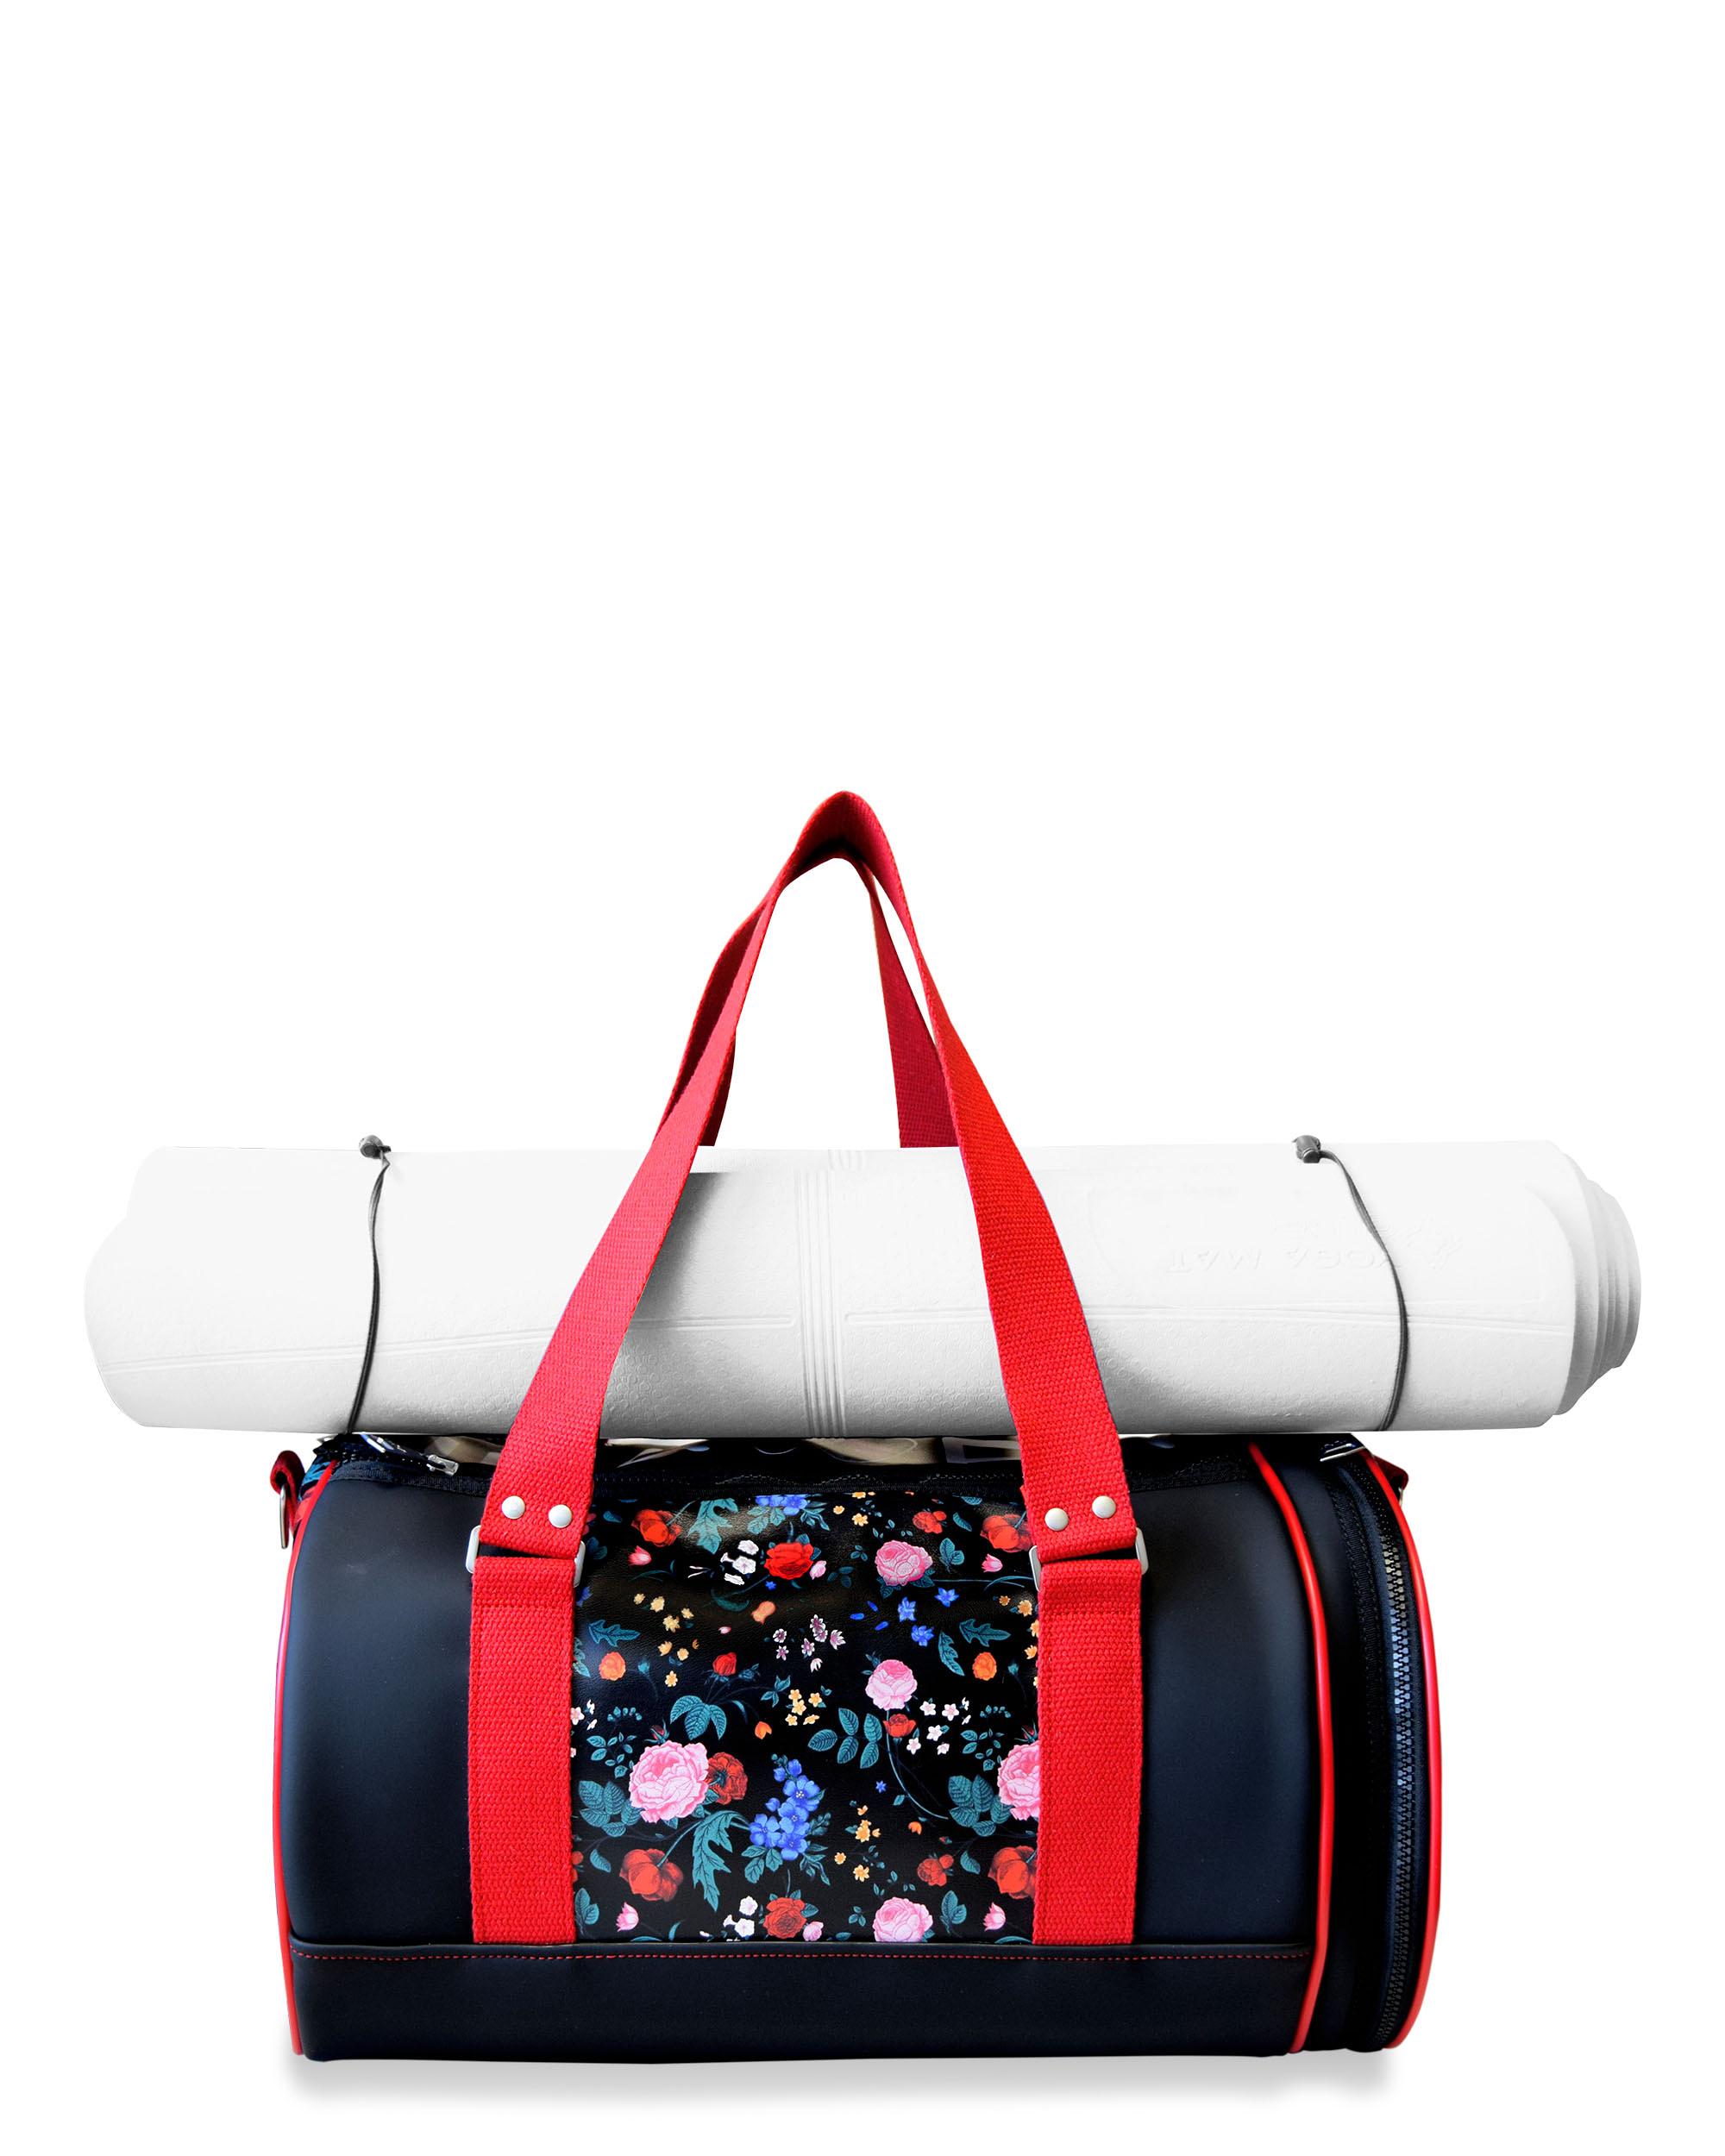 Yoga Duffle Bag Fl Print Bags Ce Idawen Woman And